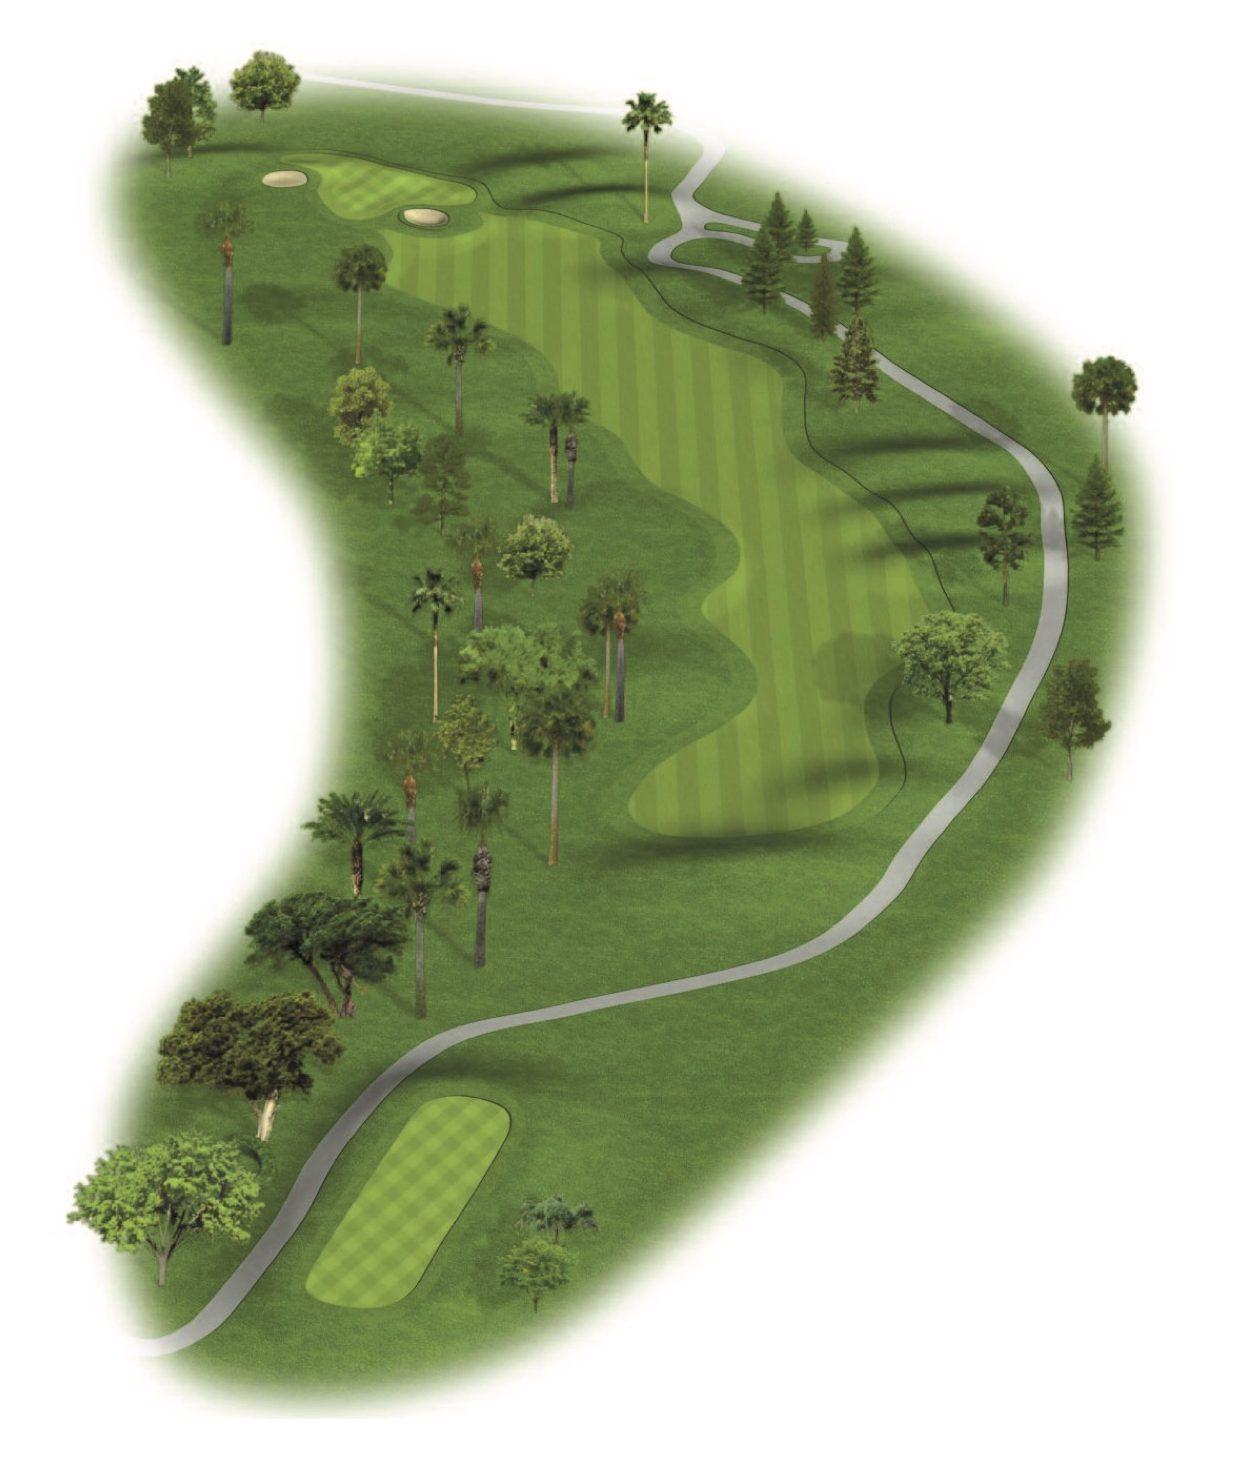 Hole 6 on the Patriot Course at The Wigwam Golf Resort near Phoenix, AZ